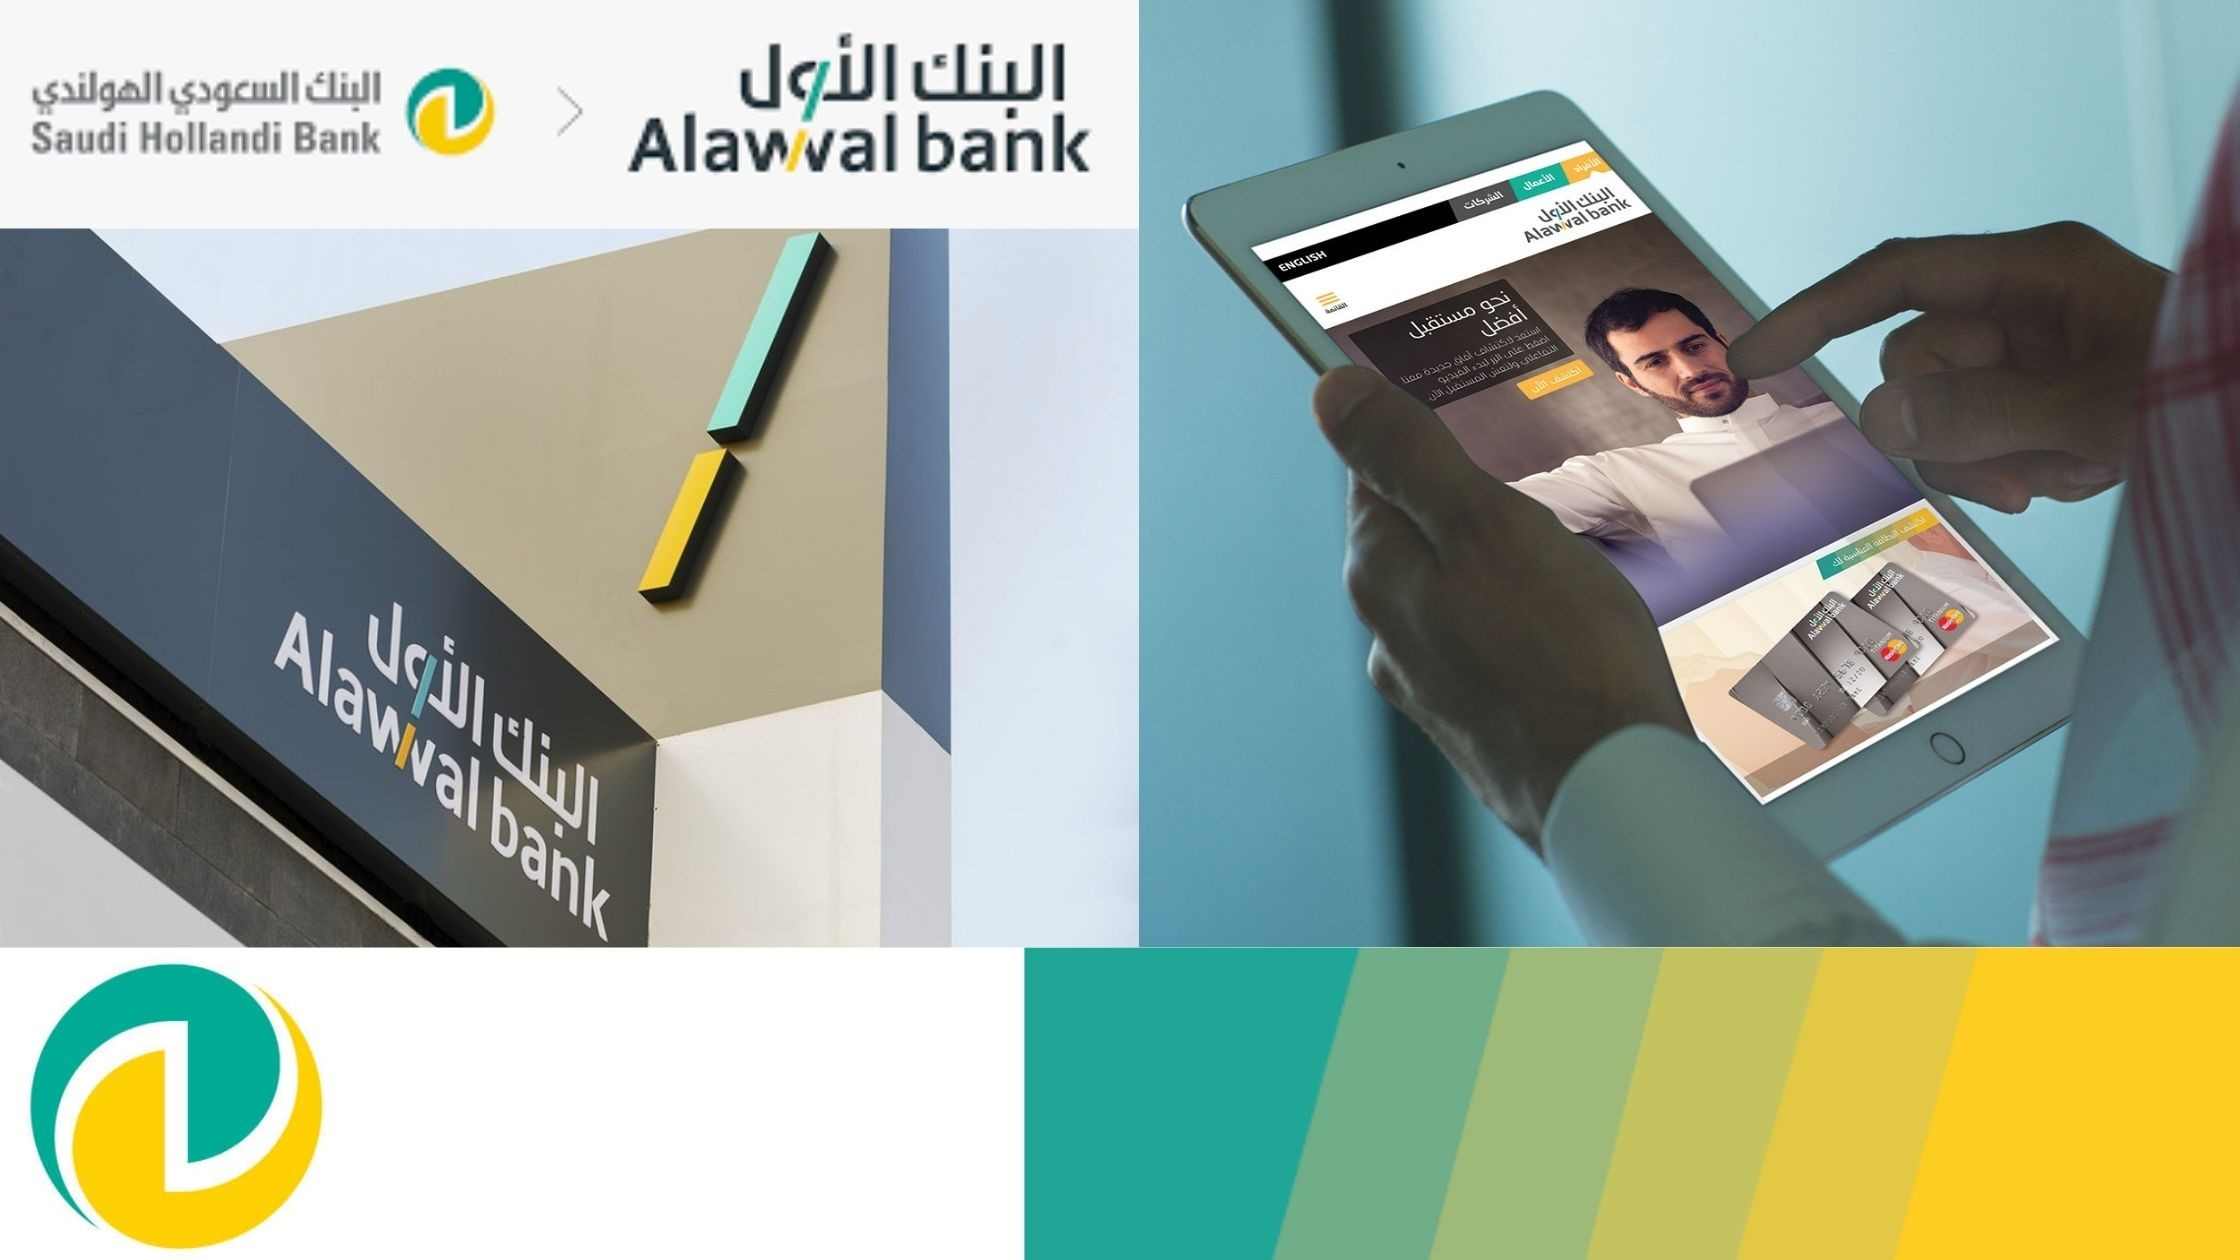 Saudi-Hollandi-Bank-To-Alawwal-Bank